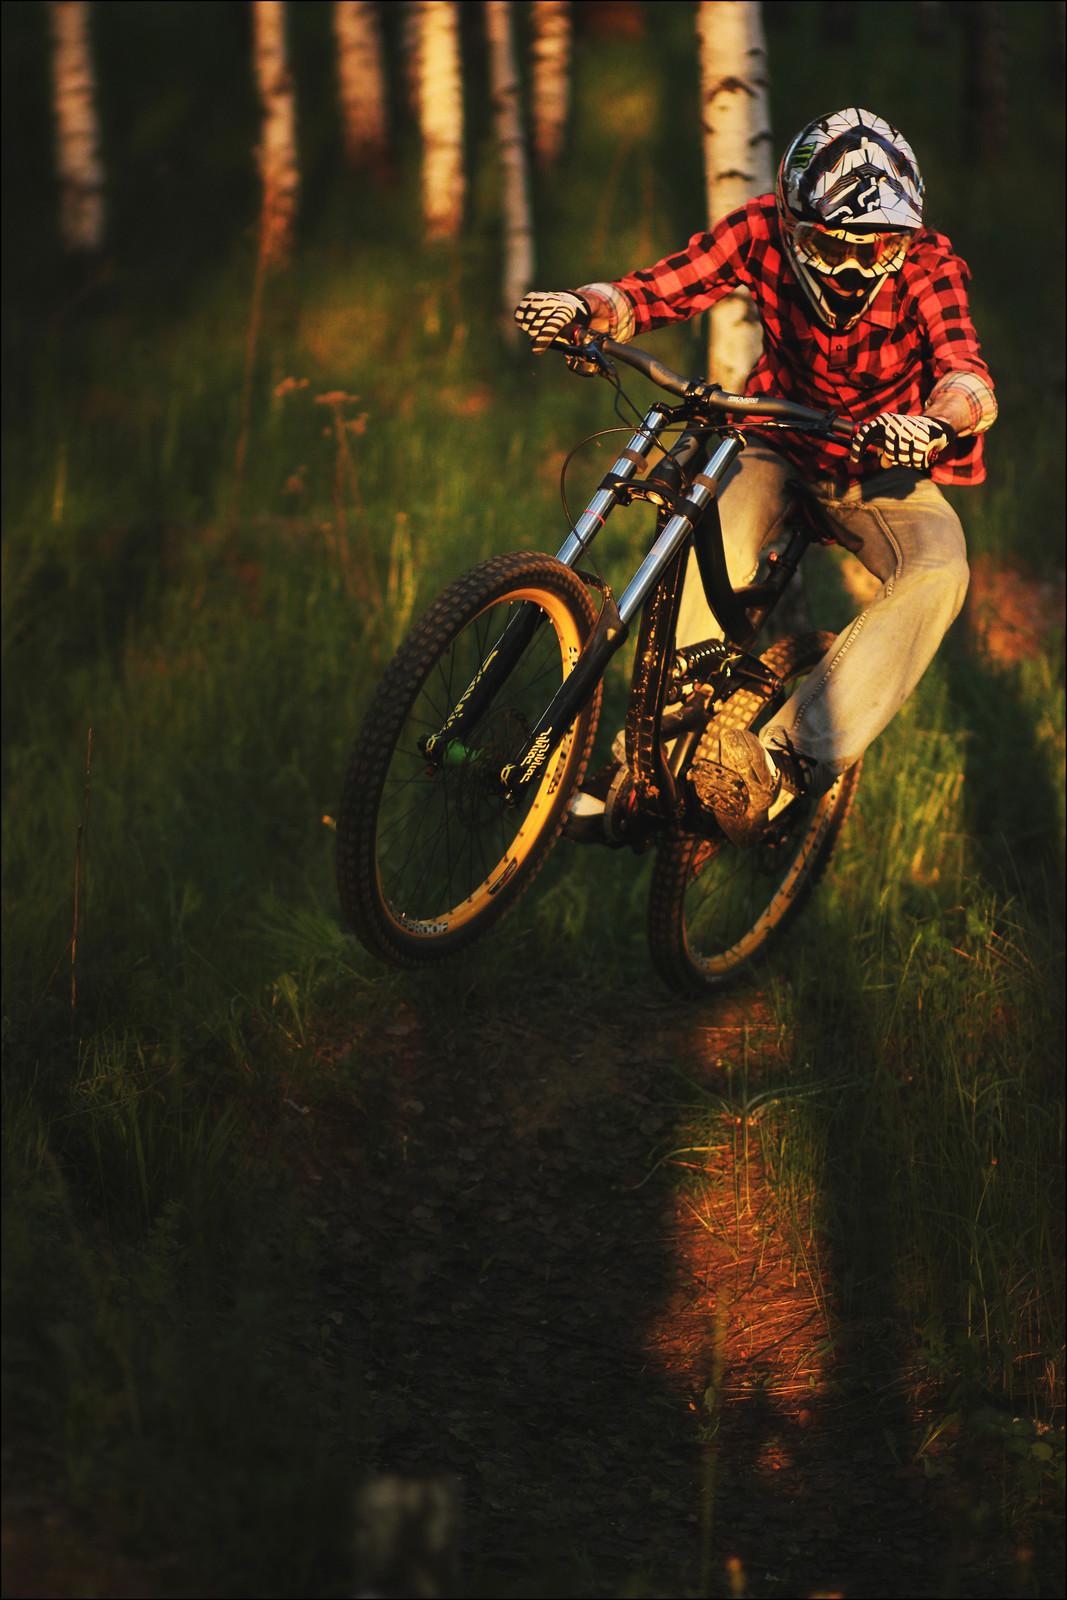 IMG 3383 - YakuT - Mountain Biking Pictures - Vital MTB